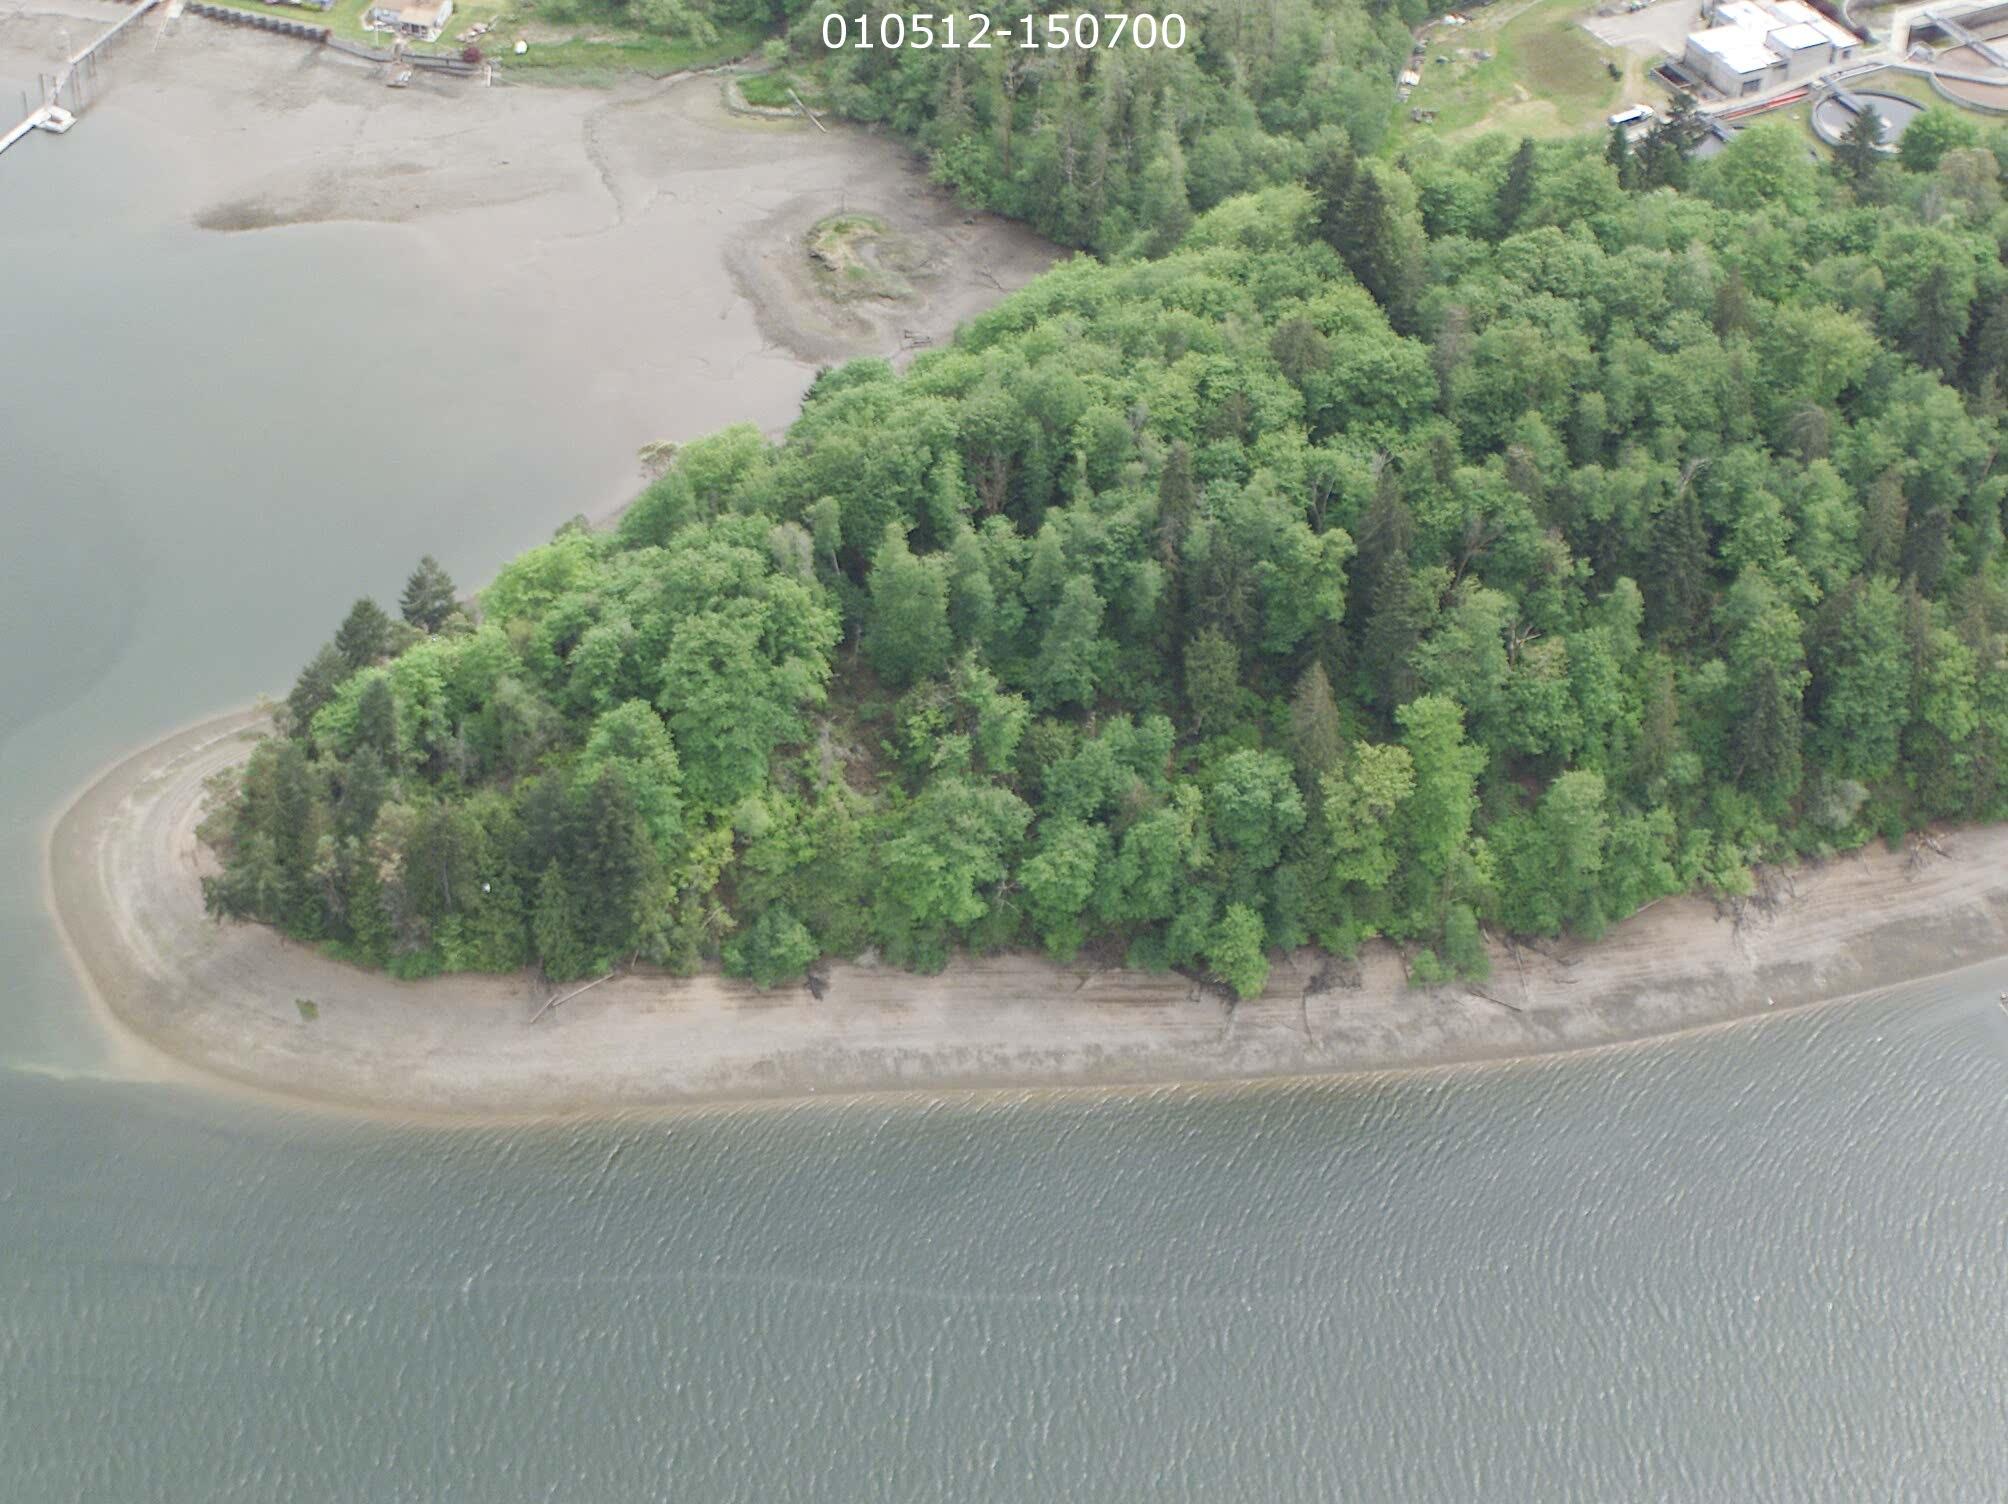 Salmon restoration results in park for Shelton